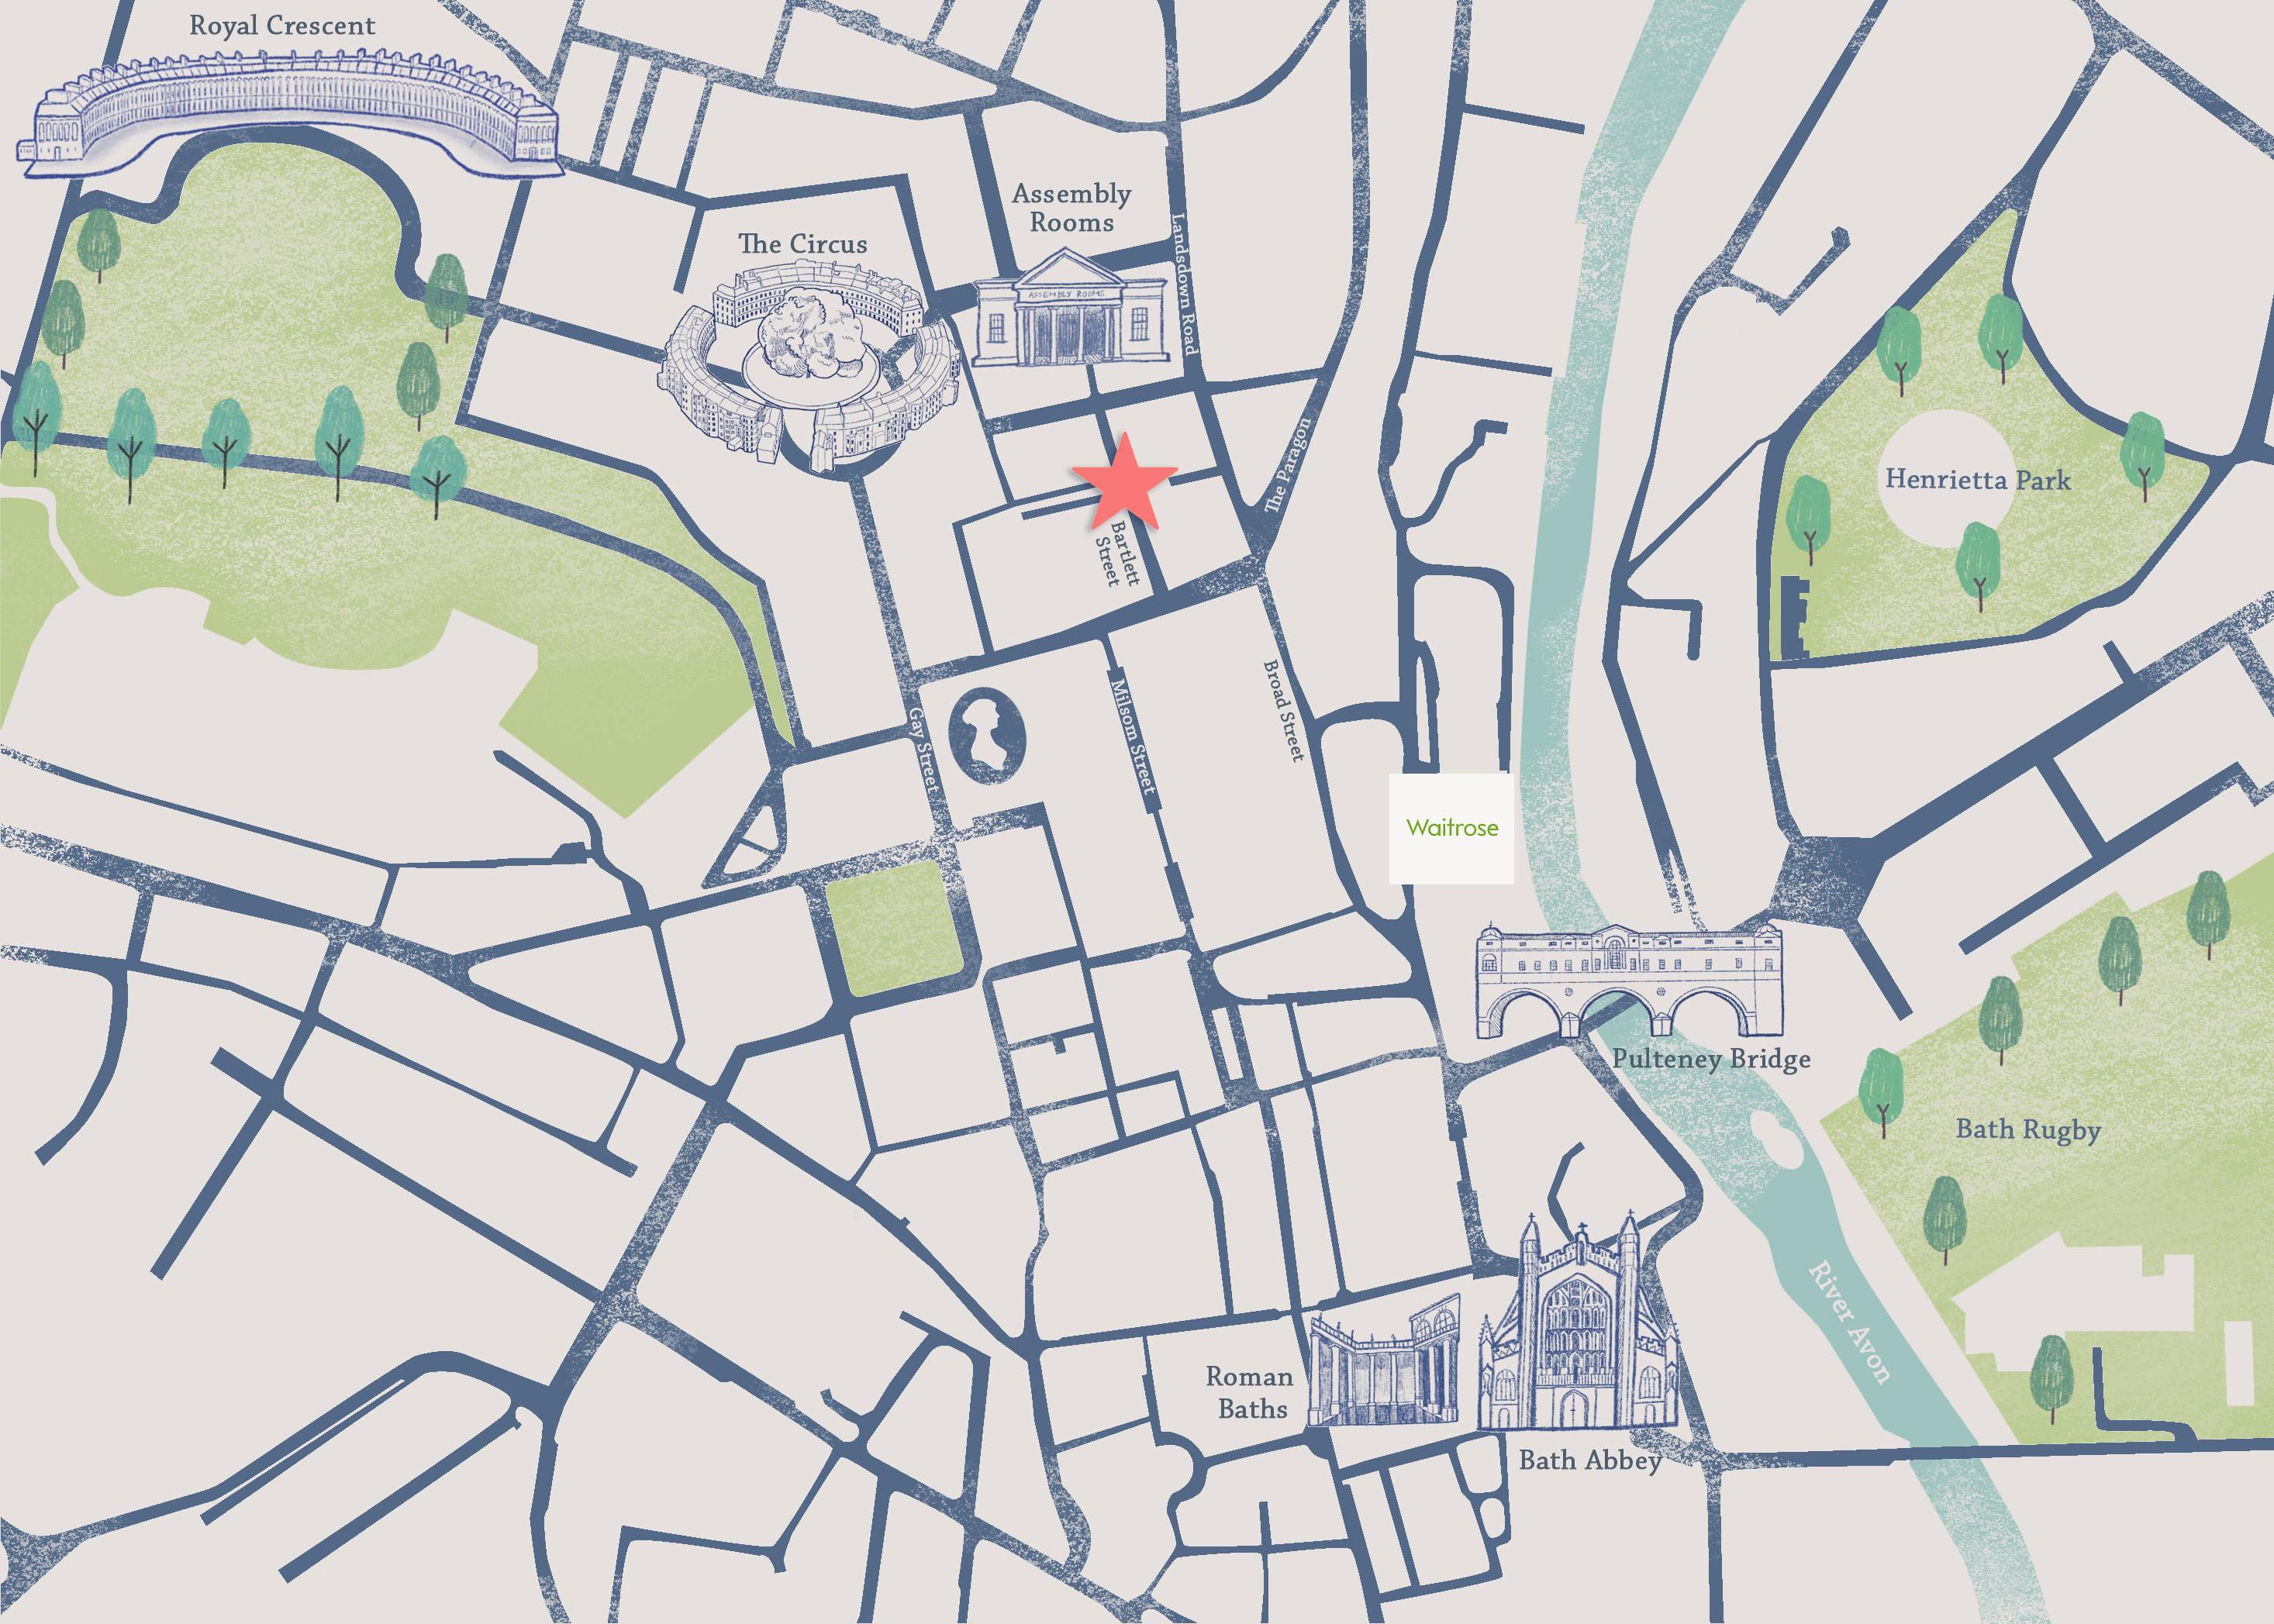 Landscape Architect Office in Bath